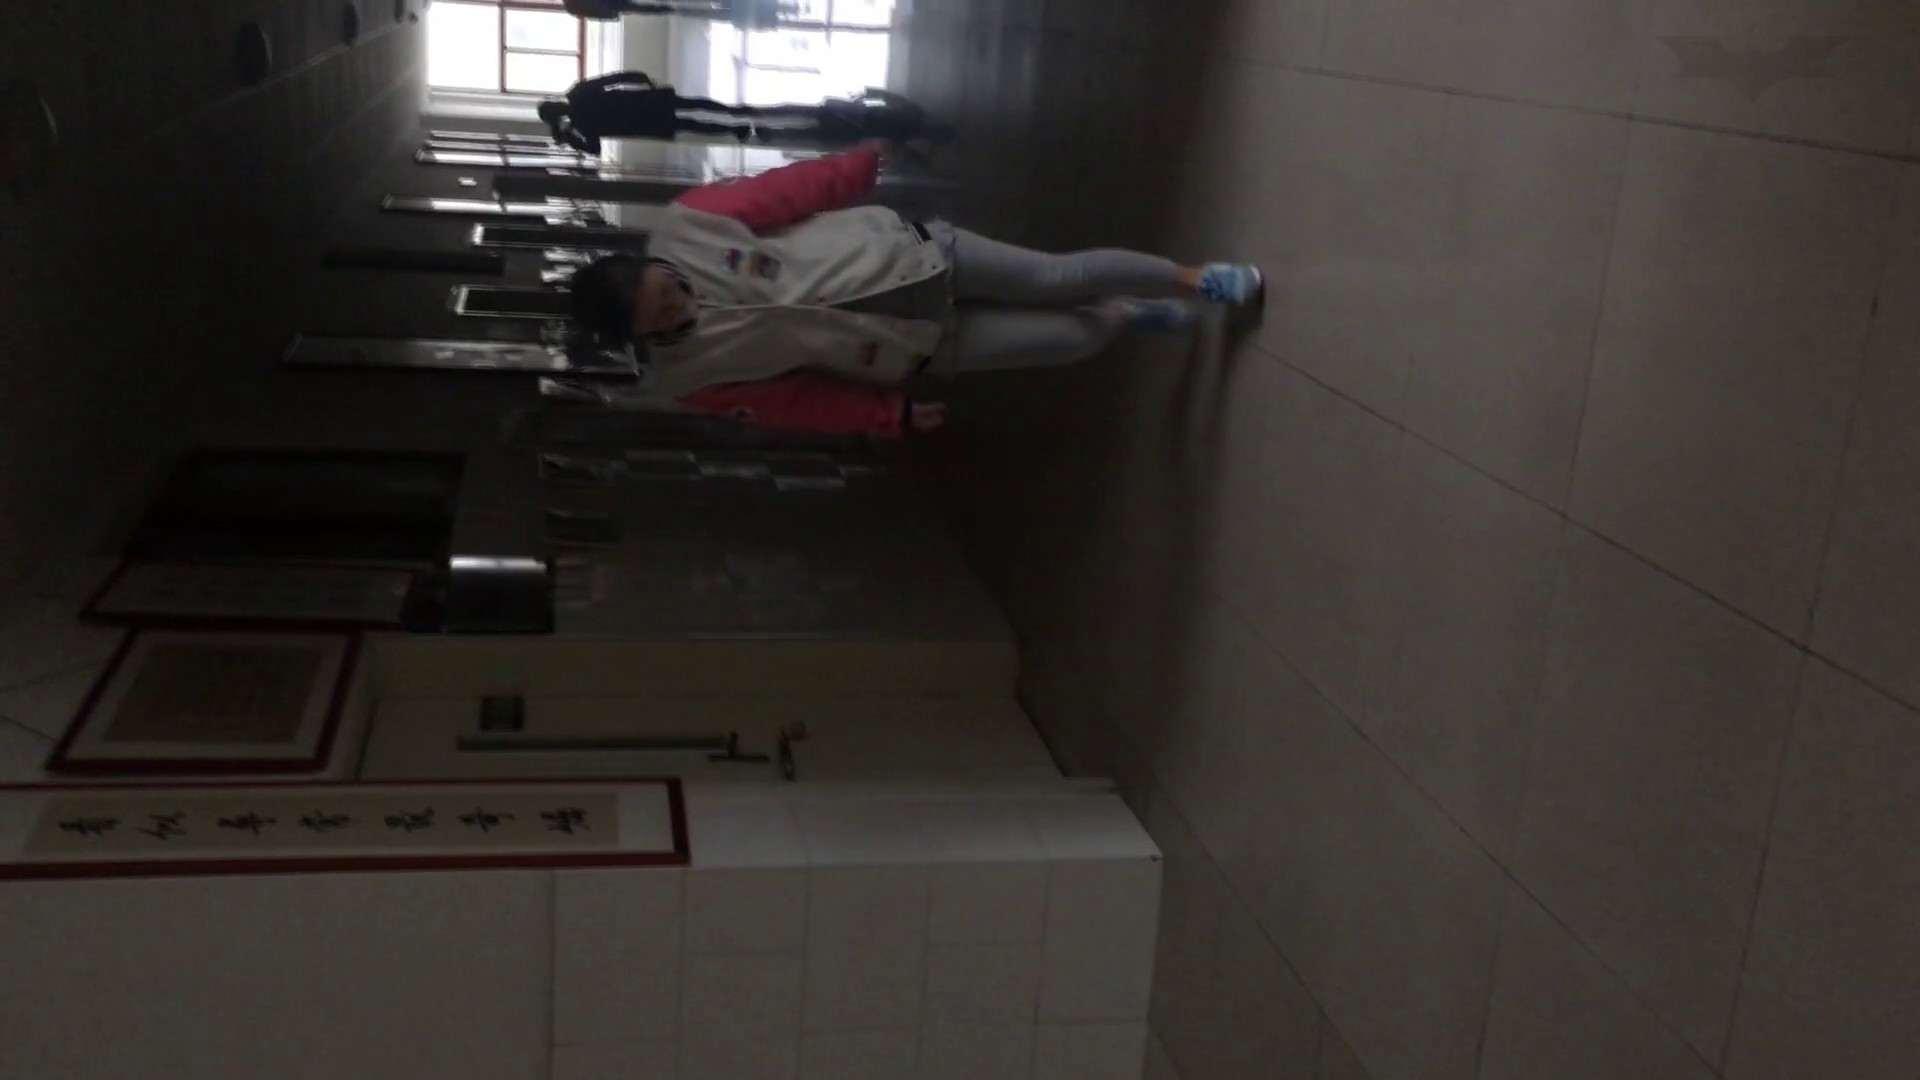 芸術大学ガチ潜入盗撮 JD盗撮 美女の洗面所の秘密 Vol.80 盛合せ  79PIX 67